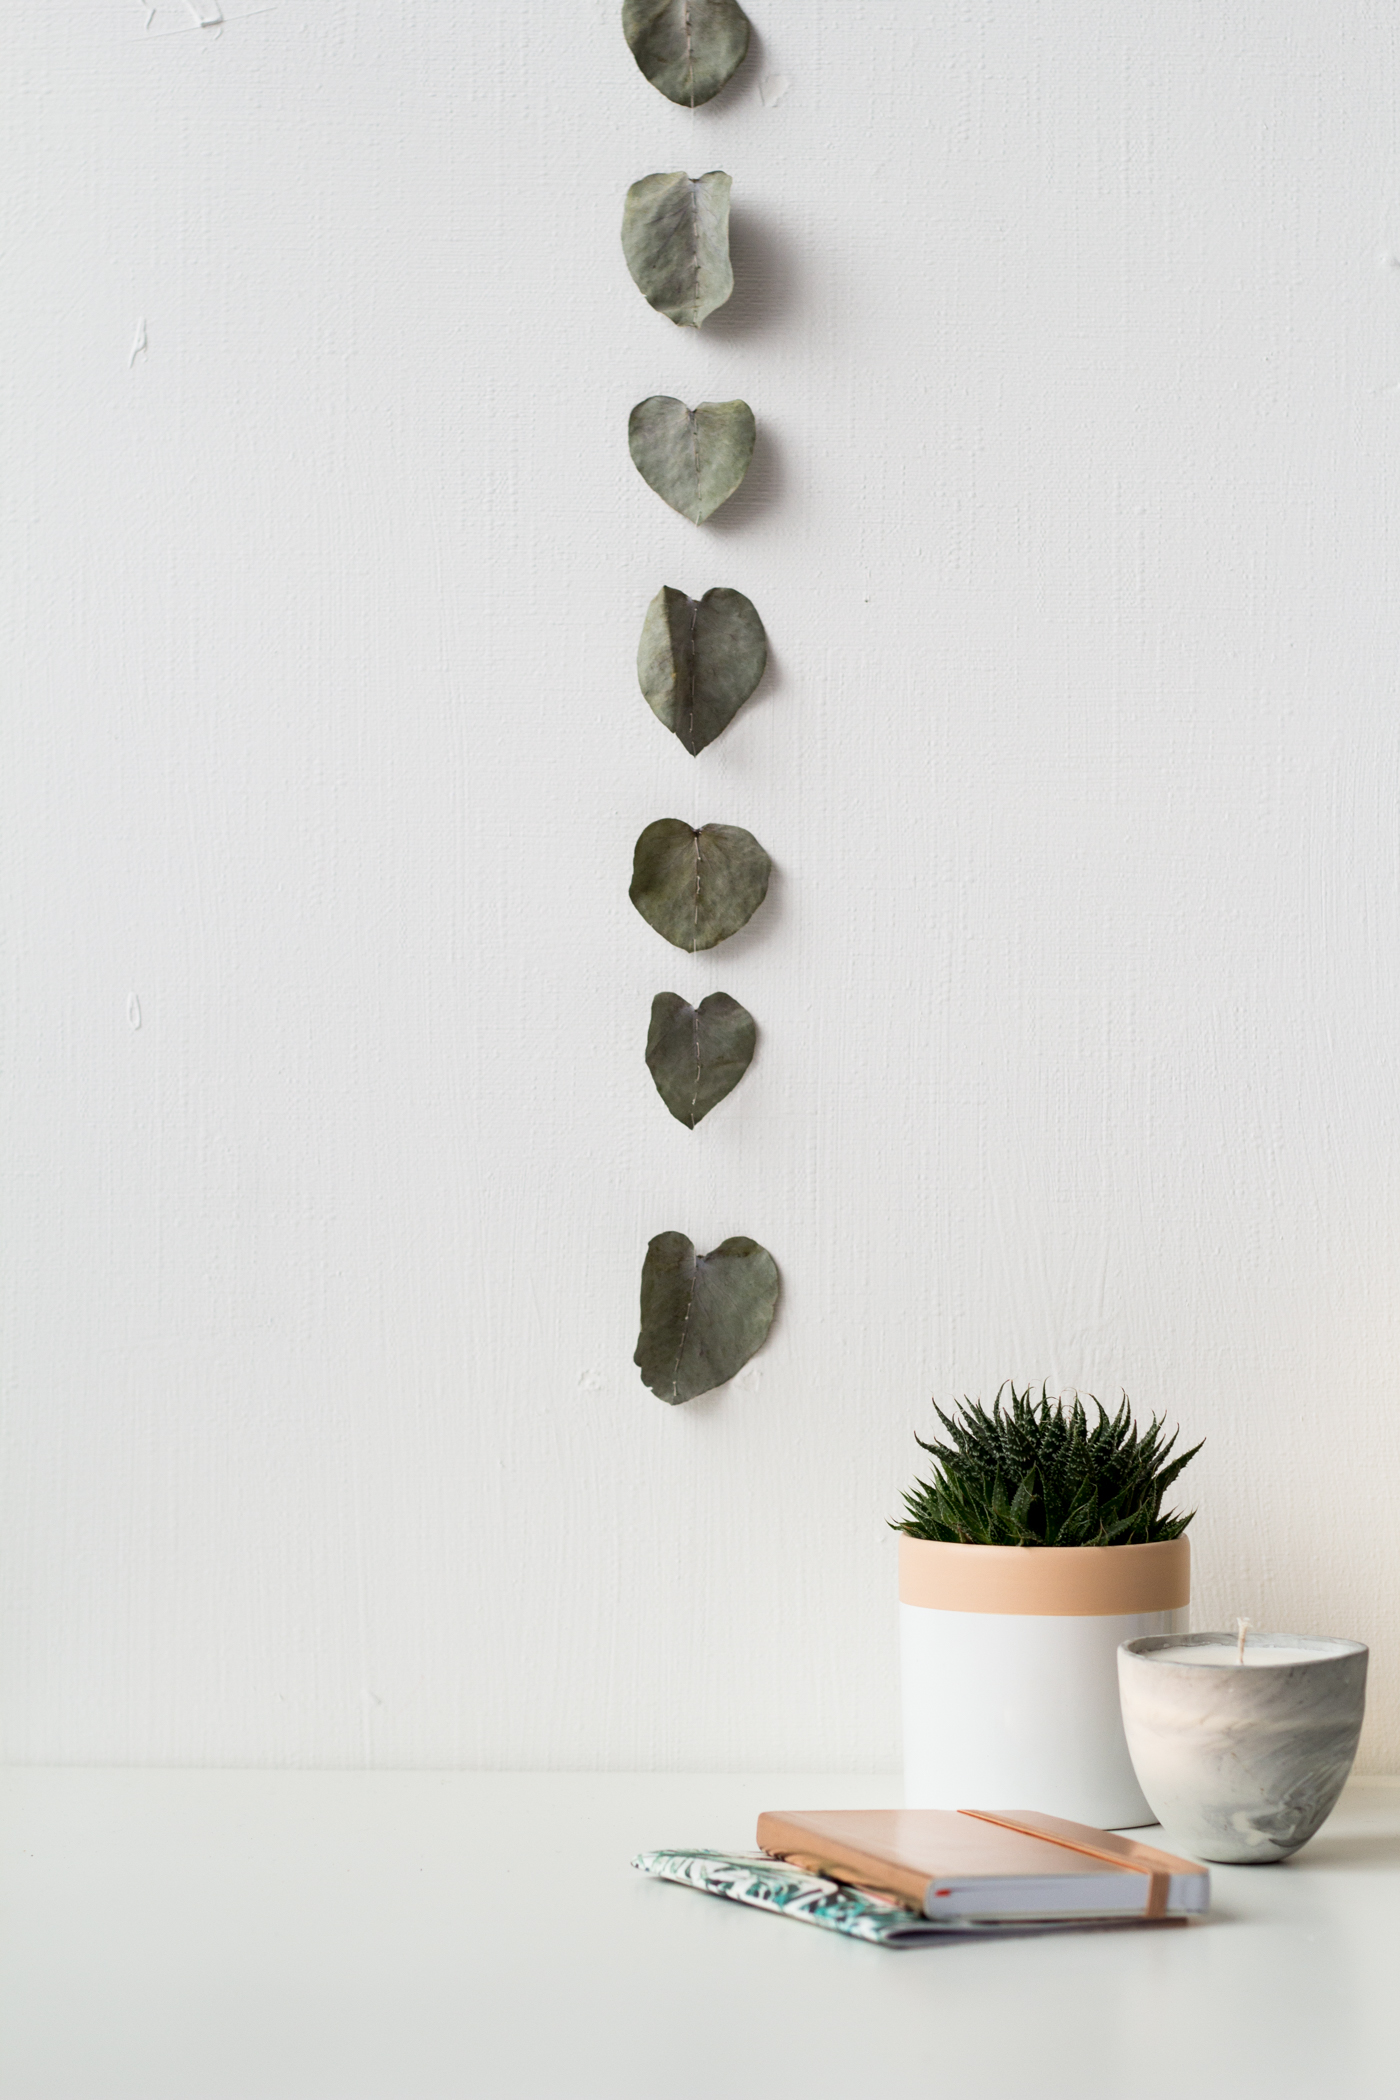 DIY Eucalyptus Heart Garland | @fallfordiy